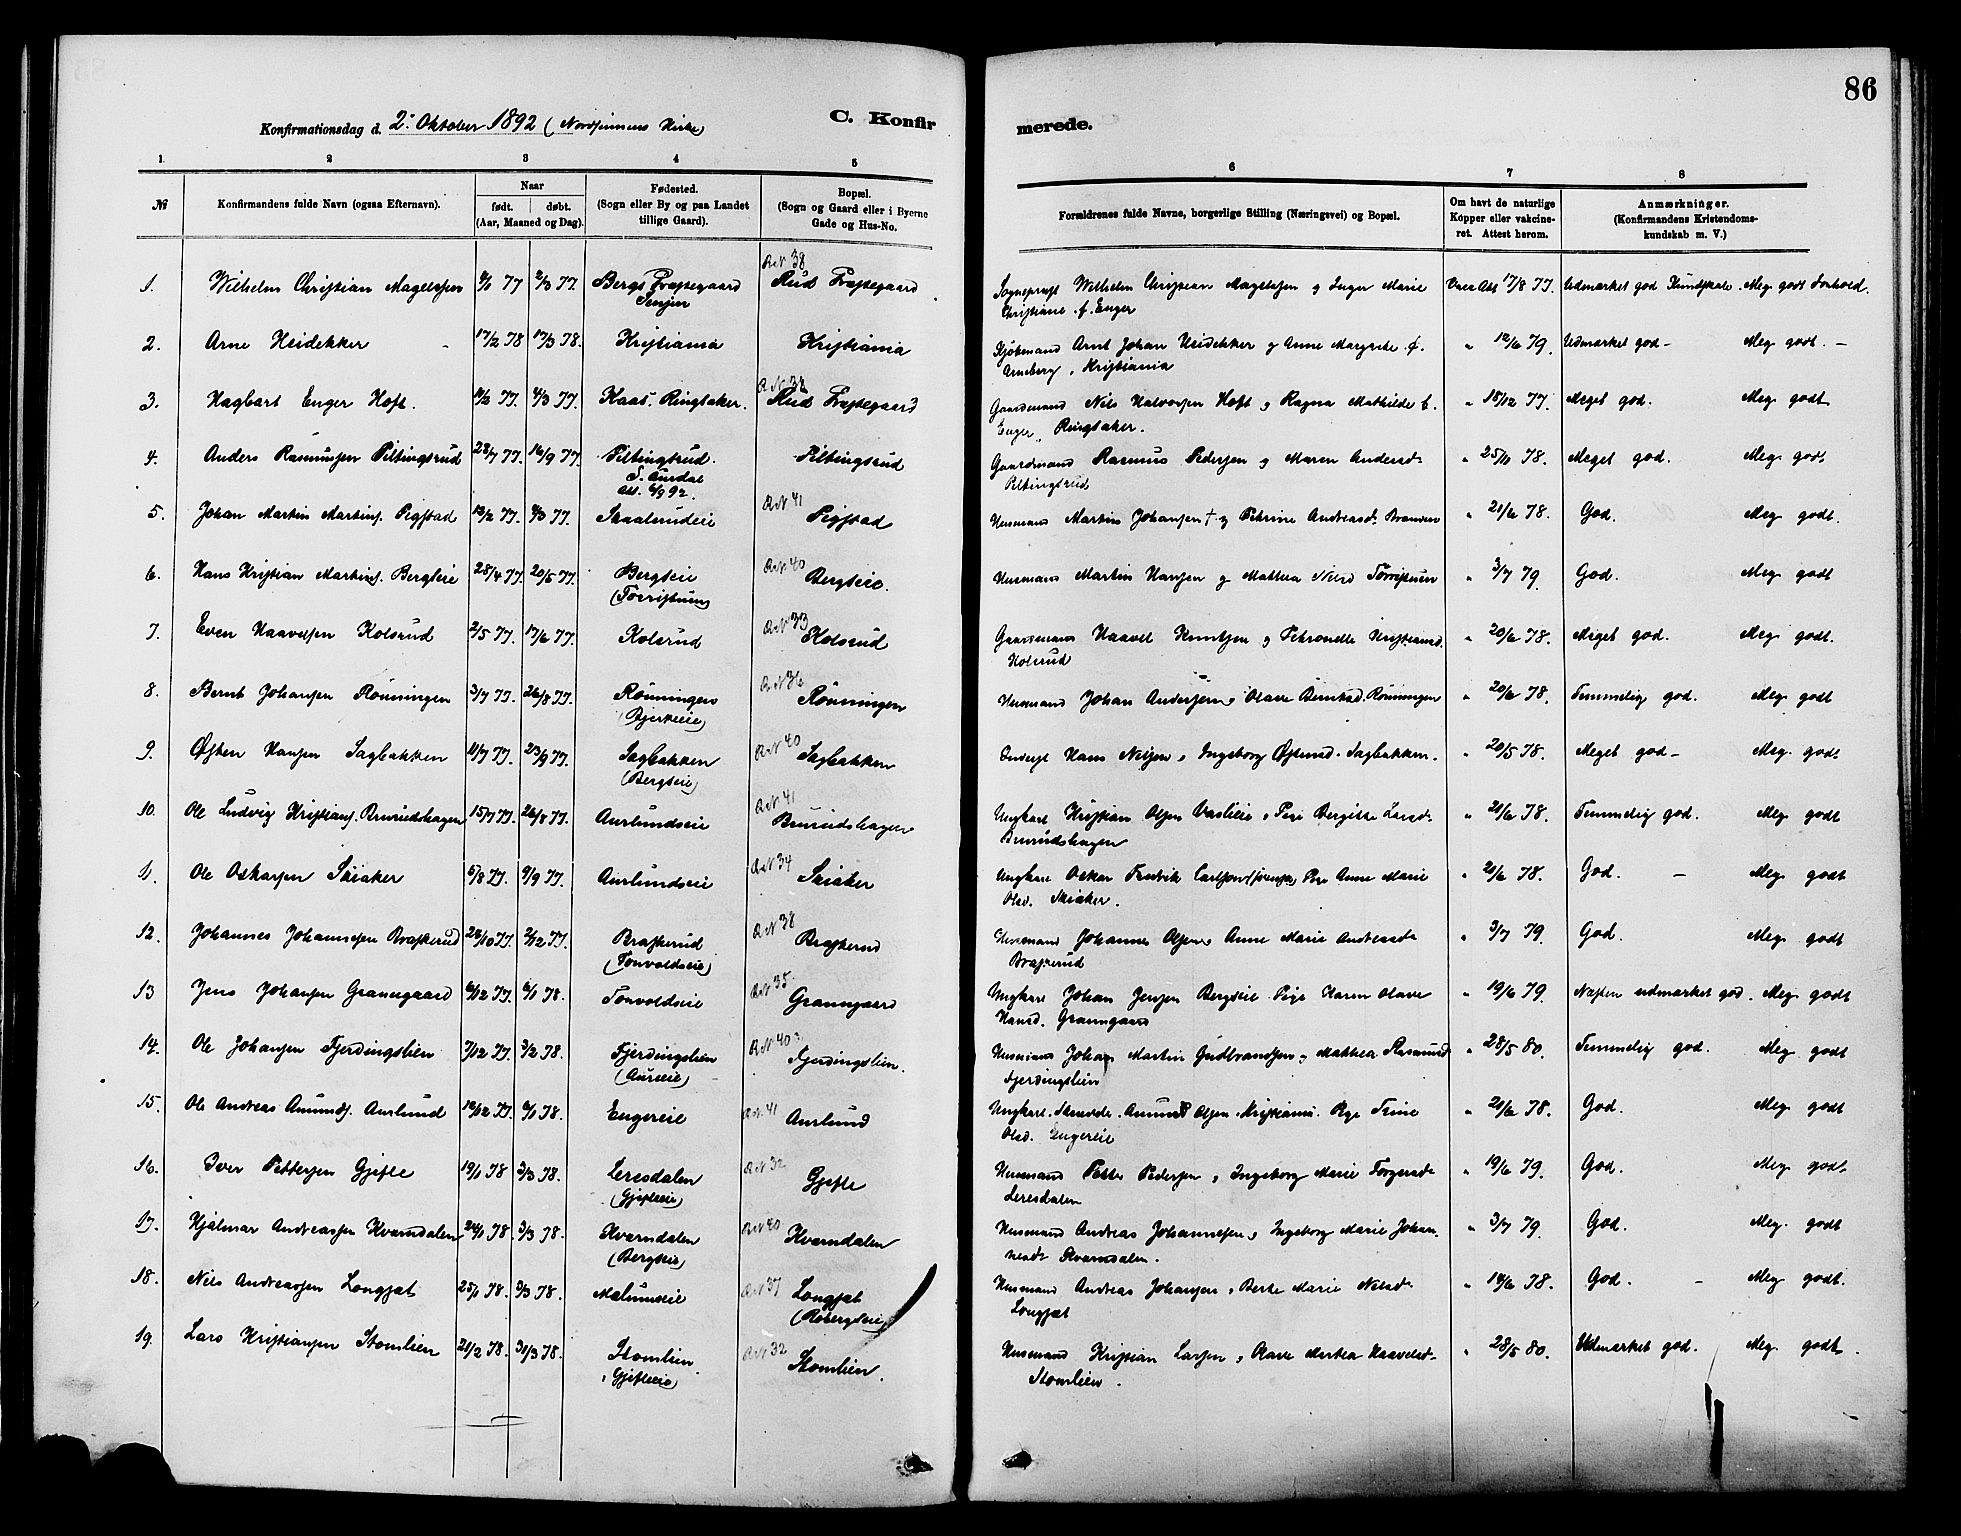 SAH, Nordre Land prestekontor, Ministerialbok nr. 3, 1882-1896, s. 86